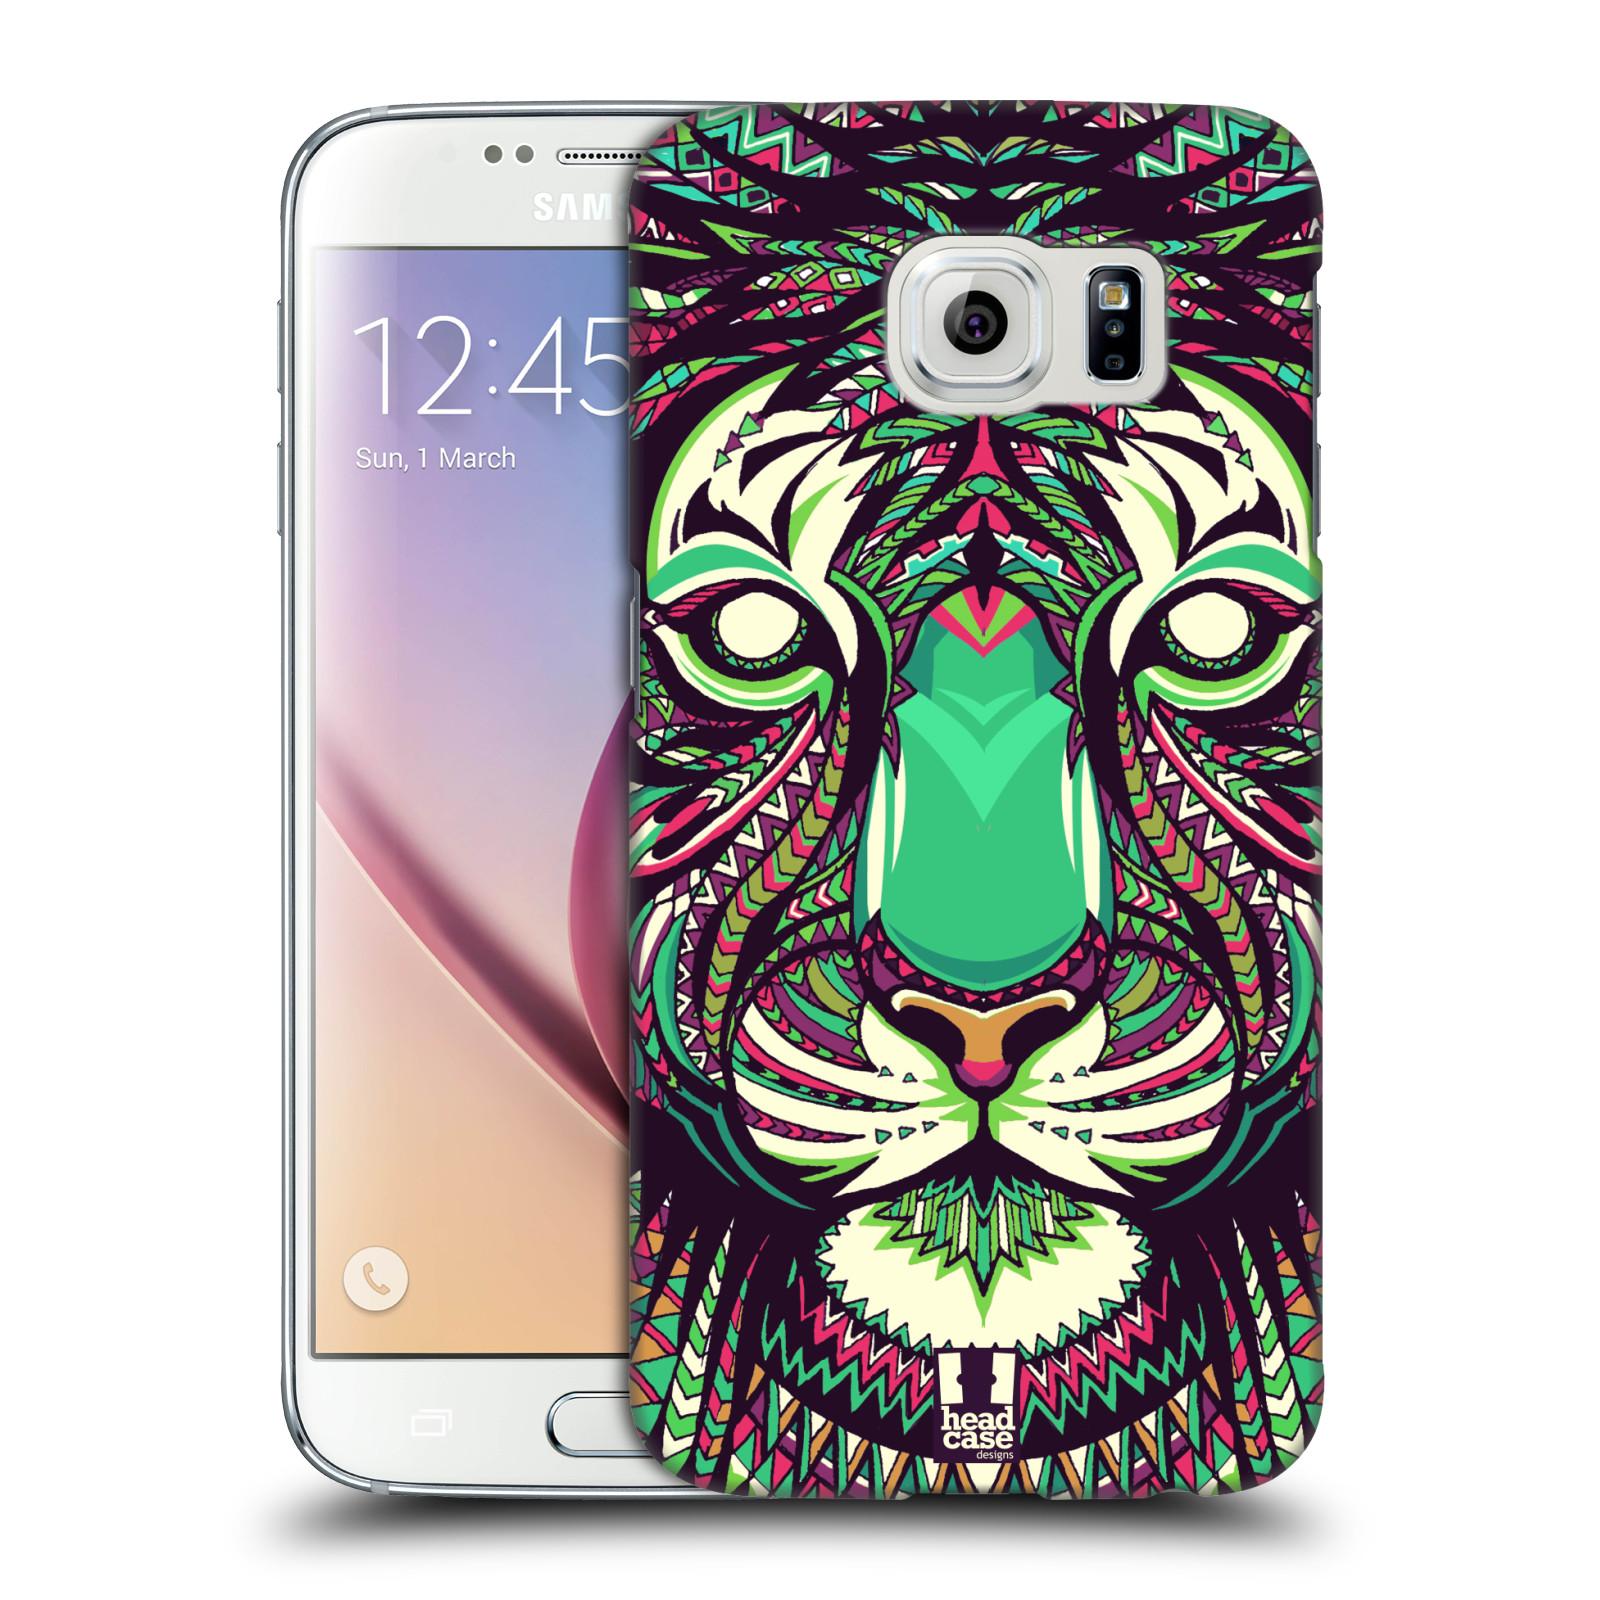 HEAD CASE plastový obal na mobil SAMSUNG Galaxy S6 (G9200, G920F) vzor Aztécký motiv zvíře 2 tygr